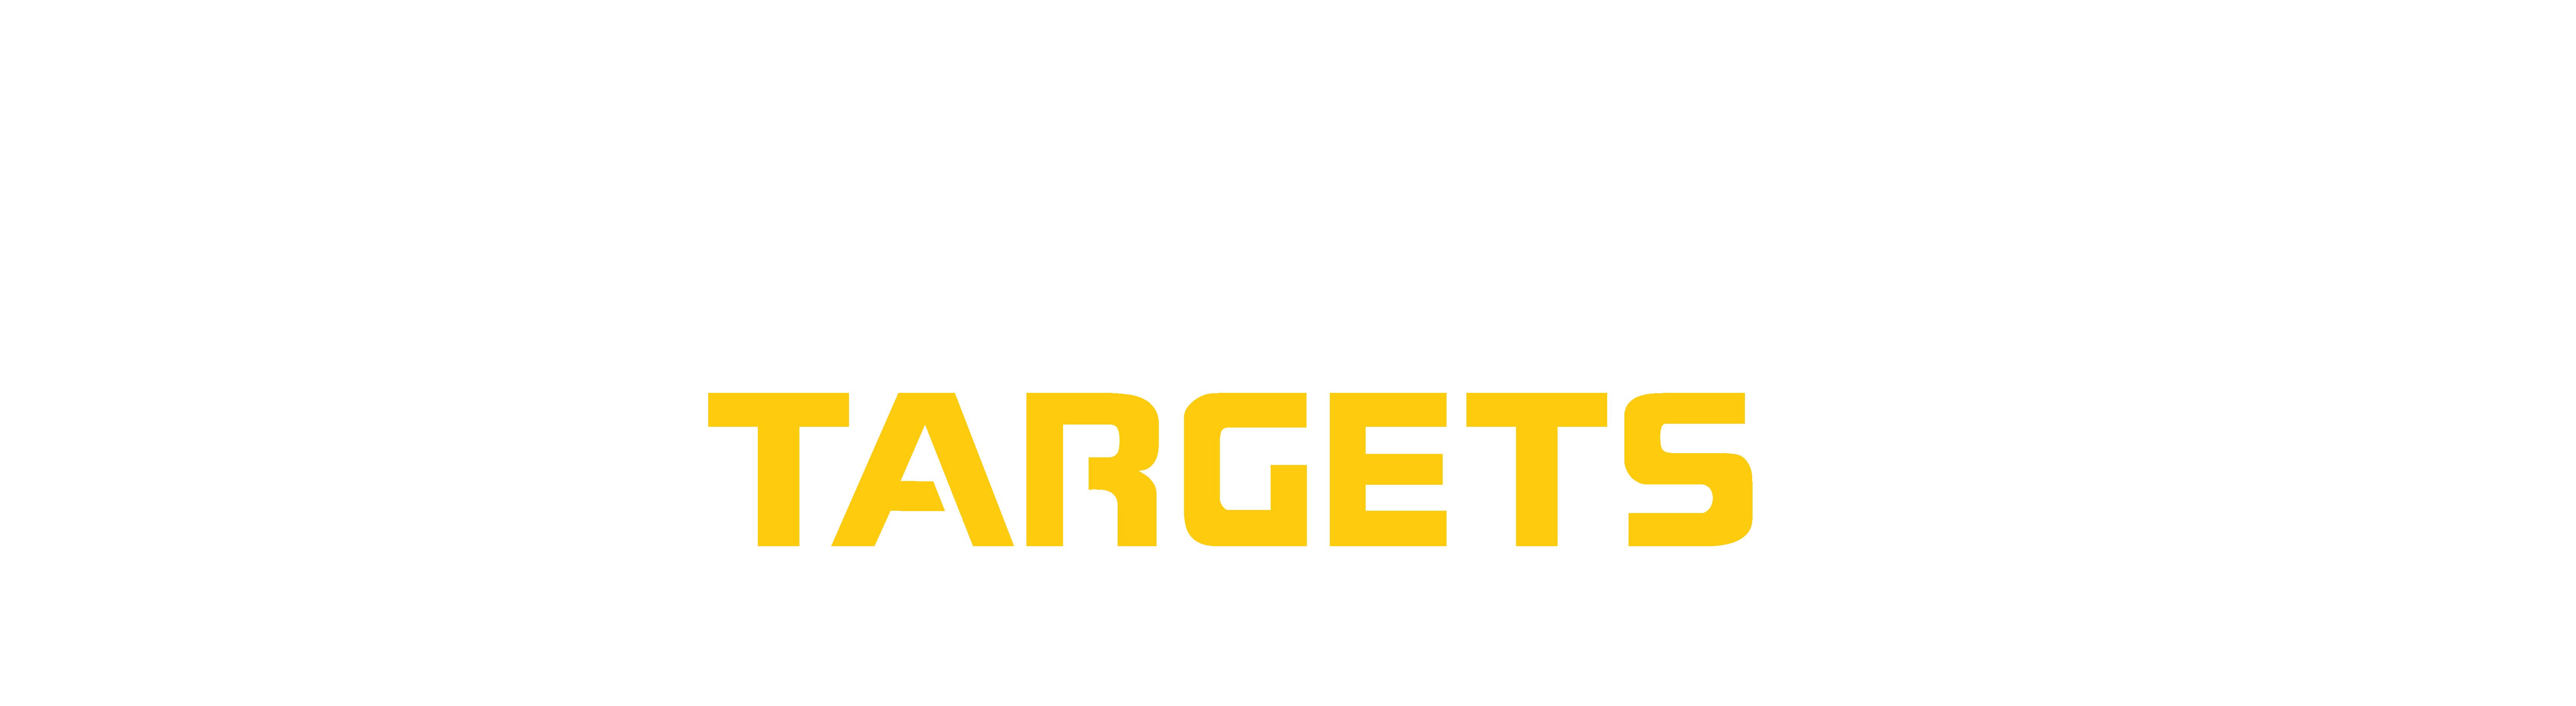 Revolution Targets